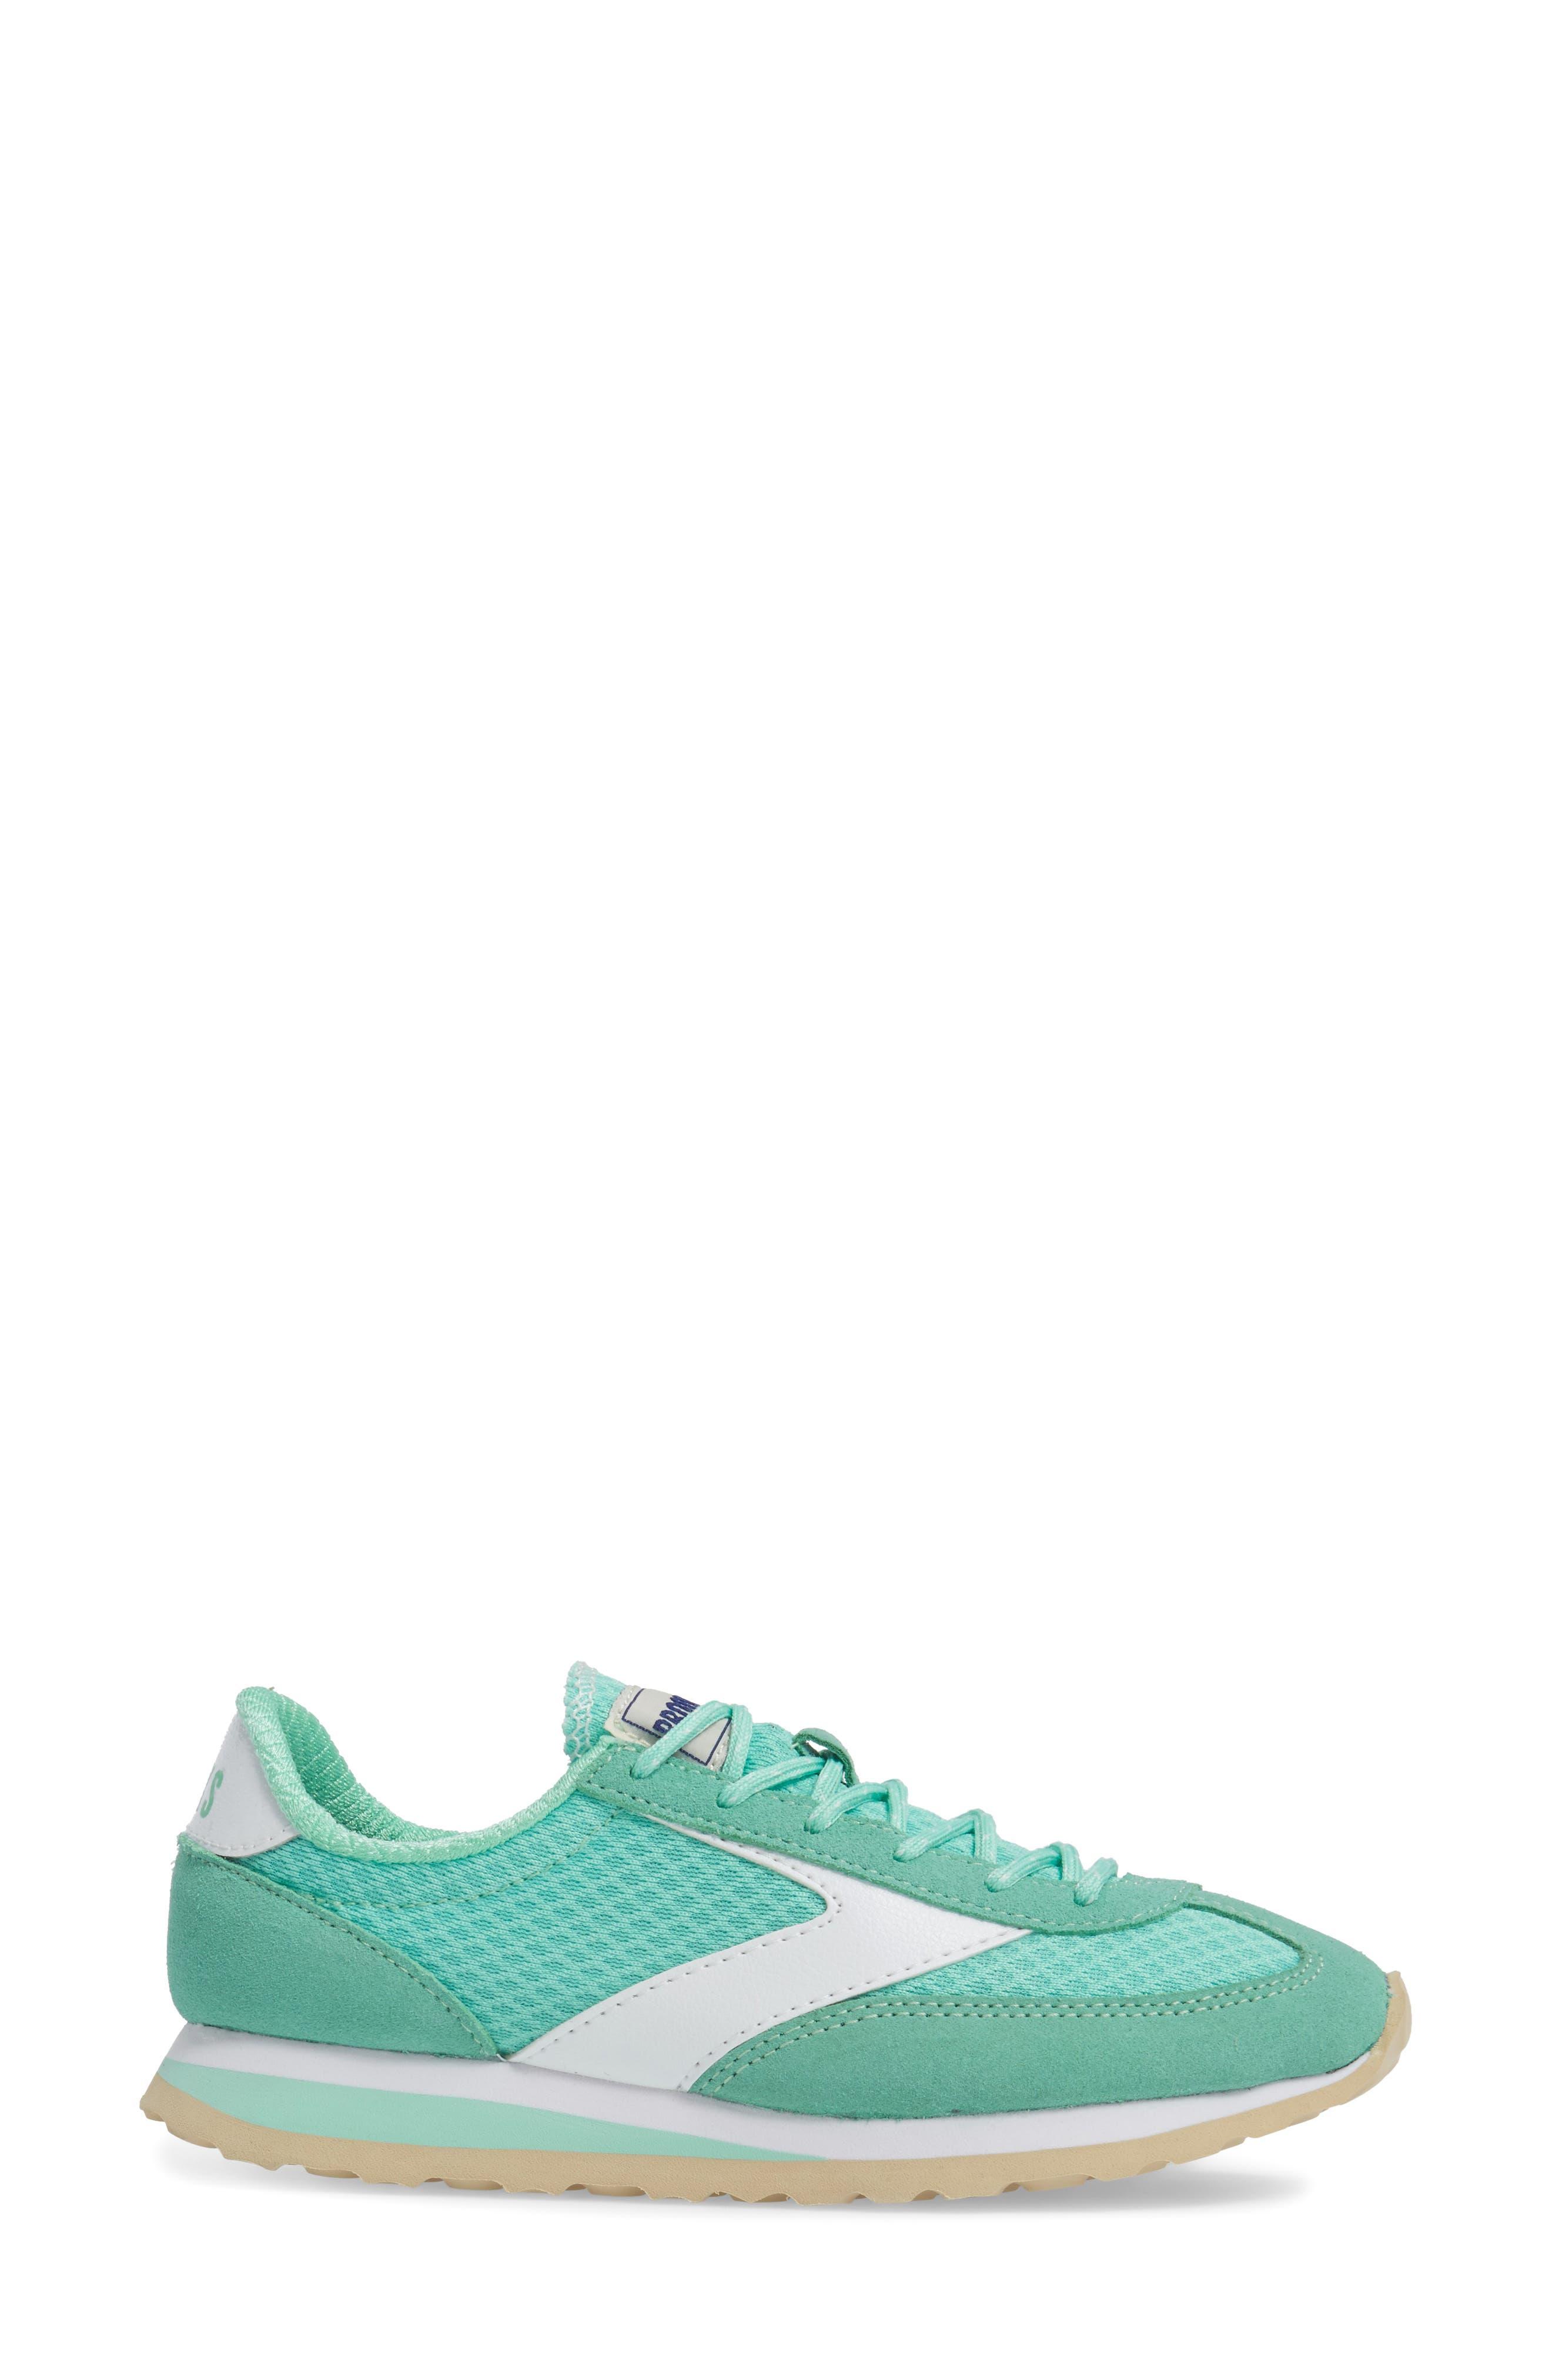 'Vanguard' Sneaker,                             Alternate thumbnail 3, color,                             024